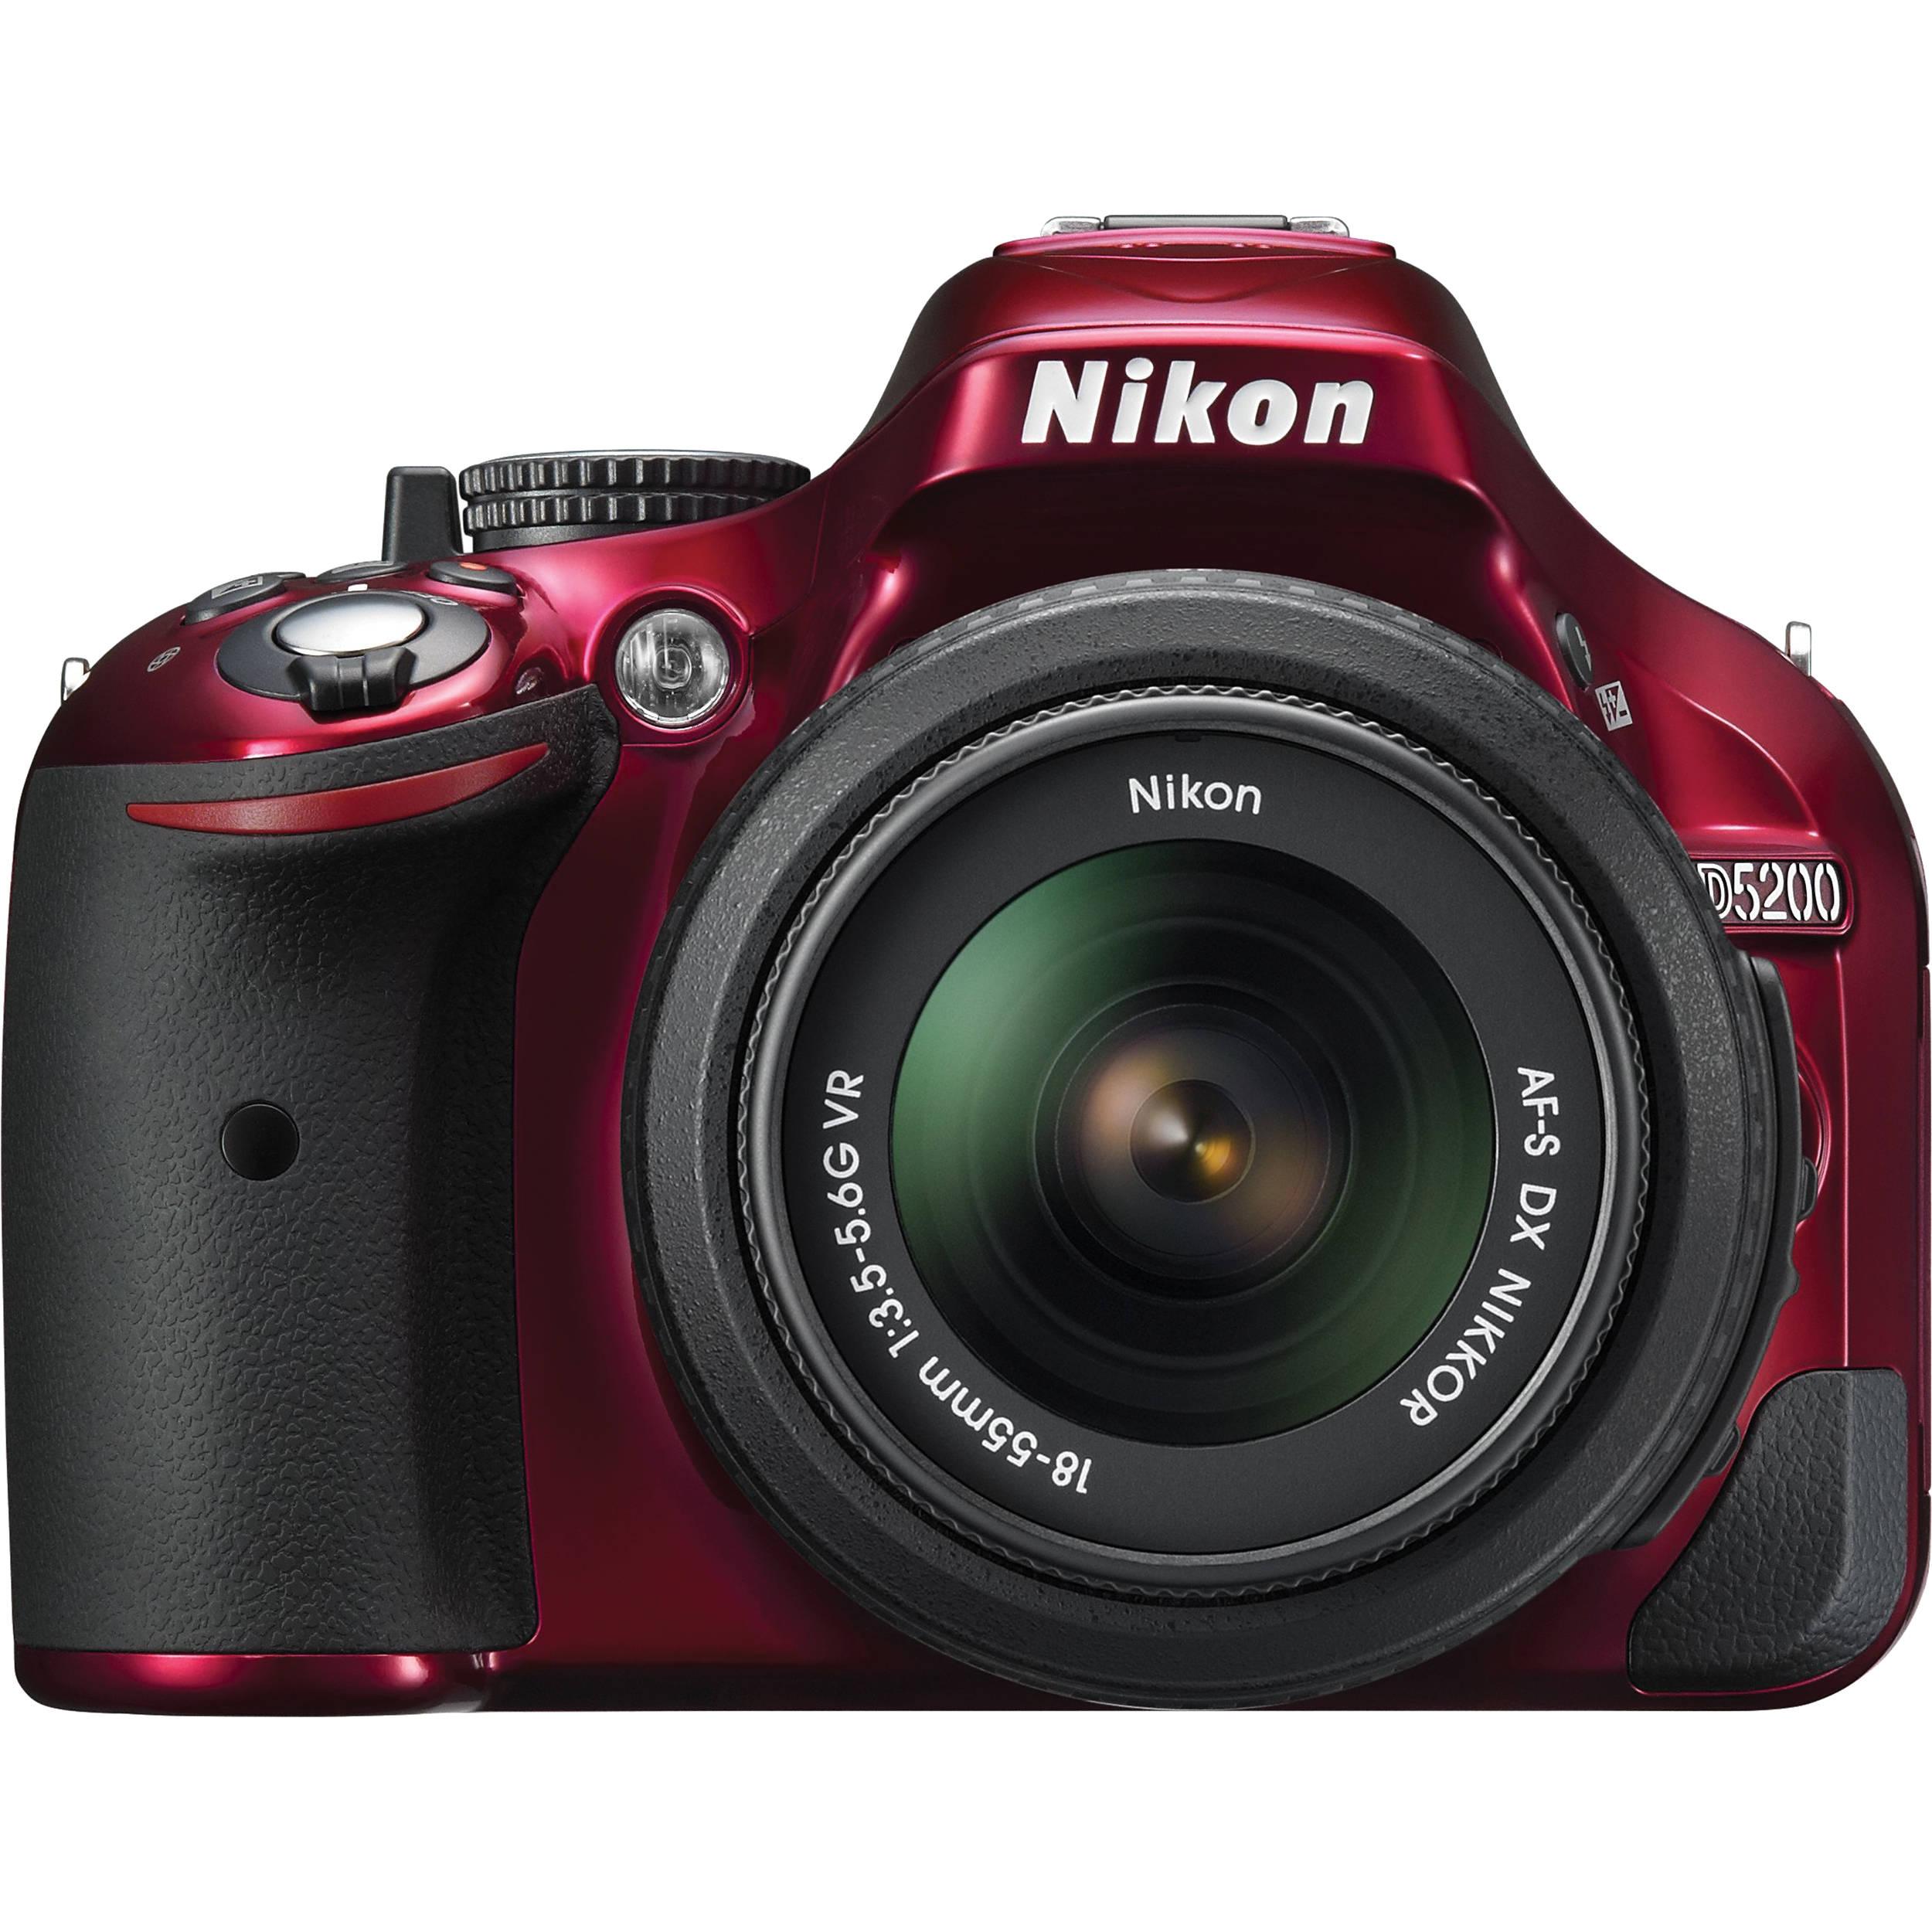 Nikon D5200 DSLR Camera with 18-55mm Lens (Red) 1507 B&H Photo